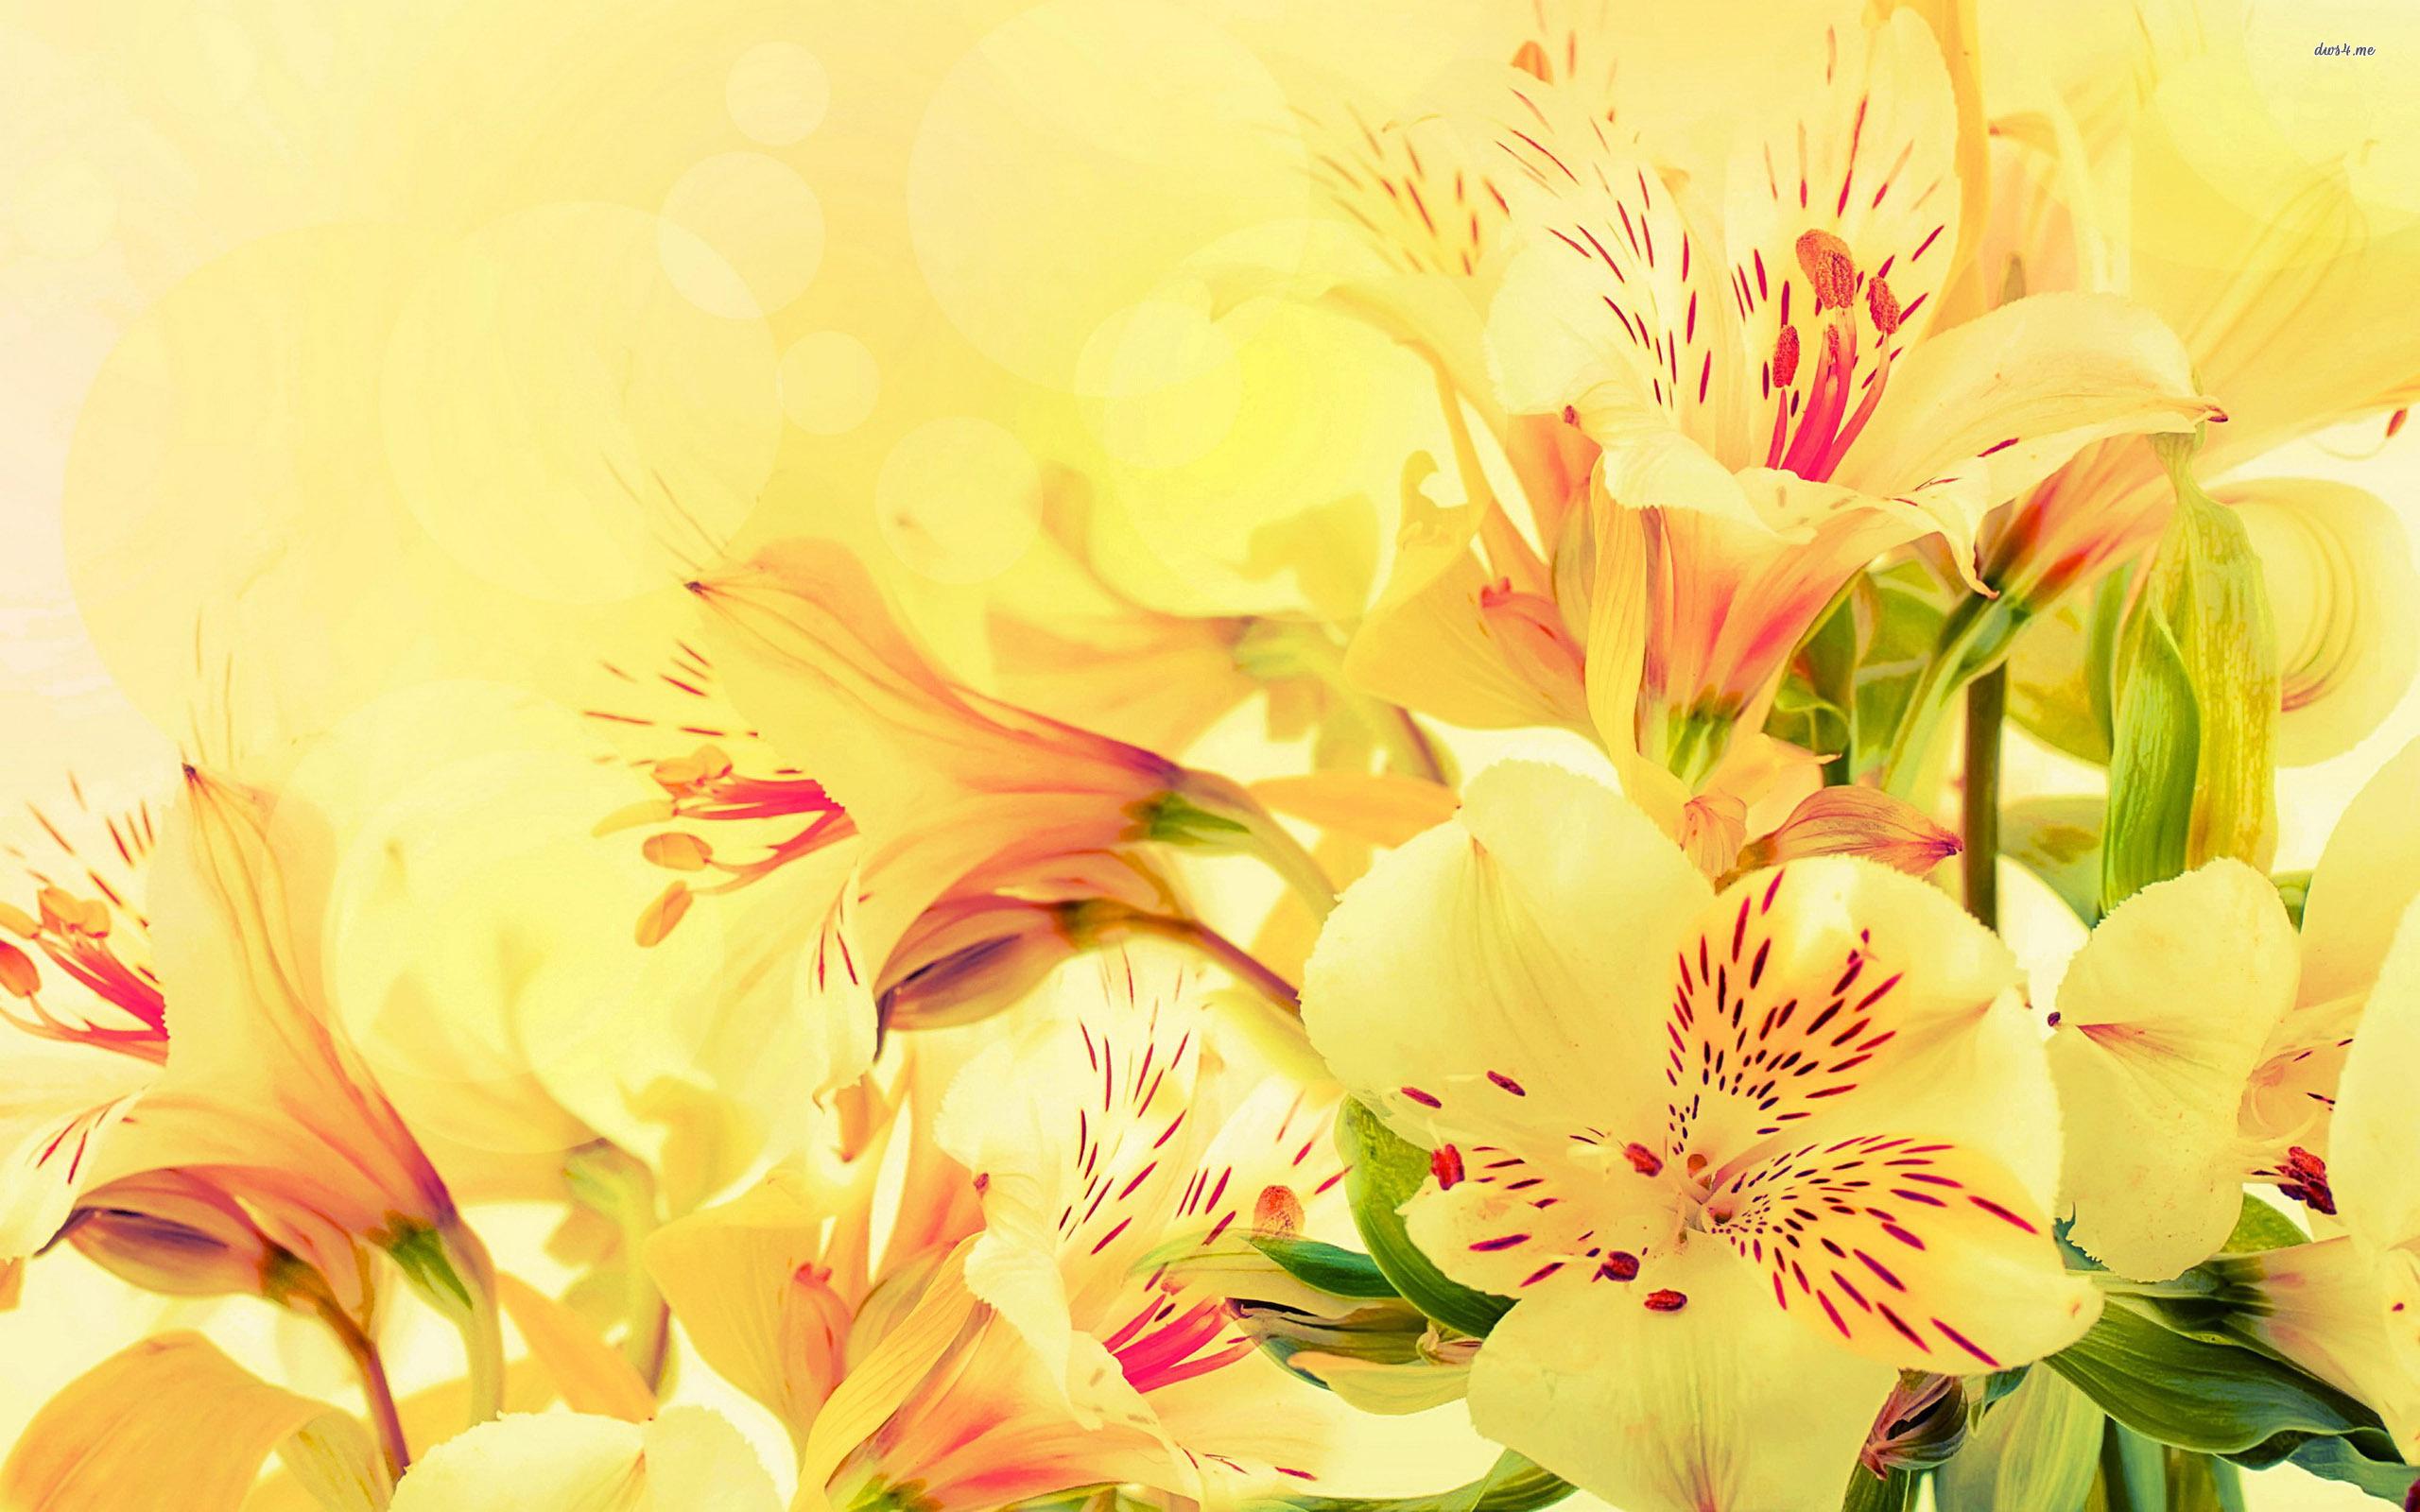 Peruvian Lilies wallpapers HD   392215 2560x1600